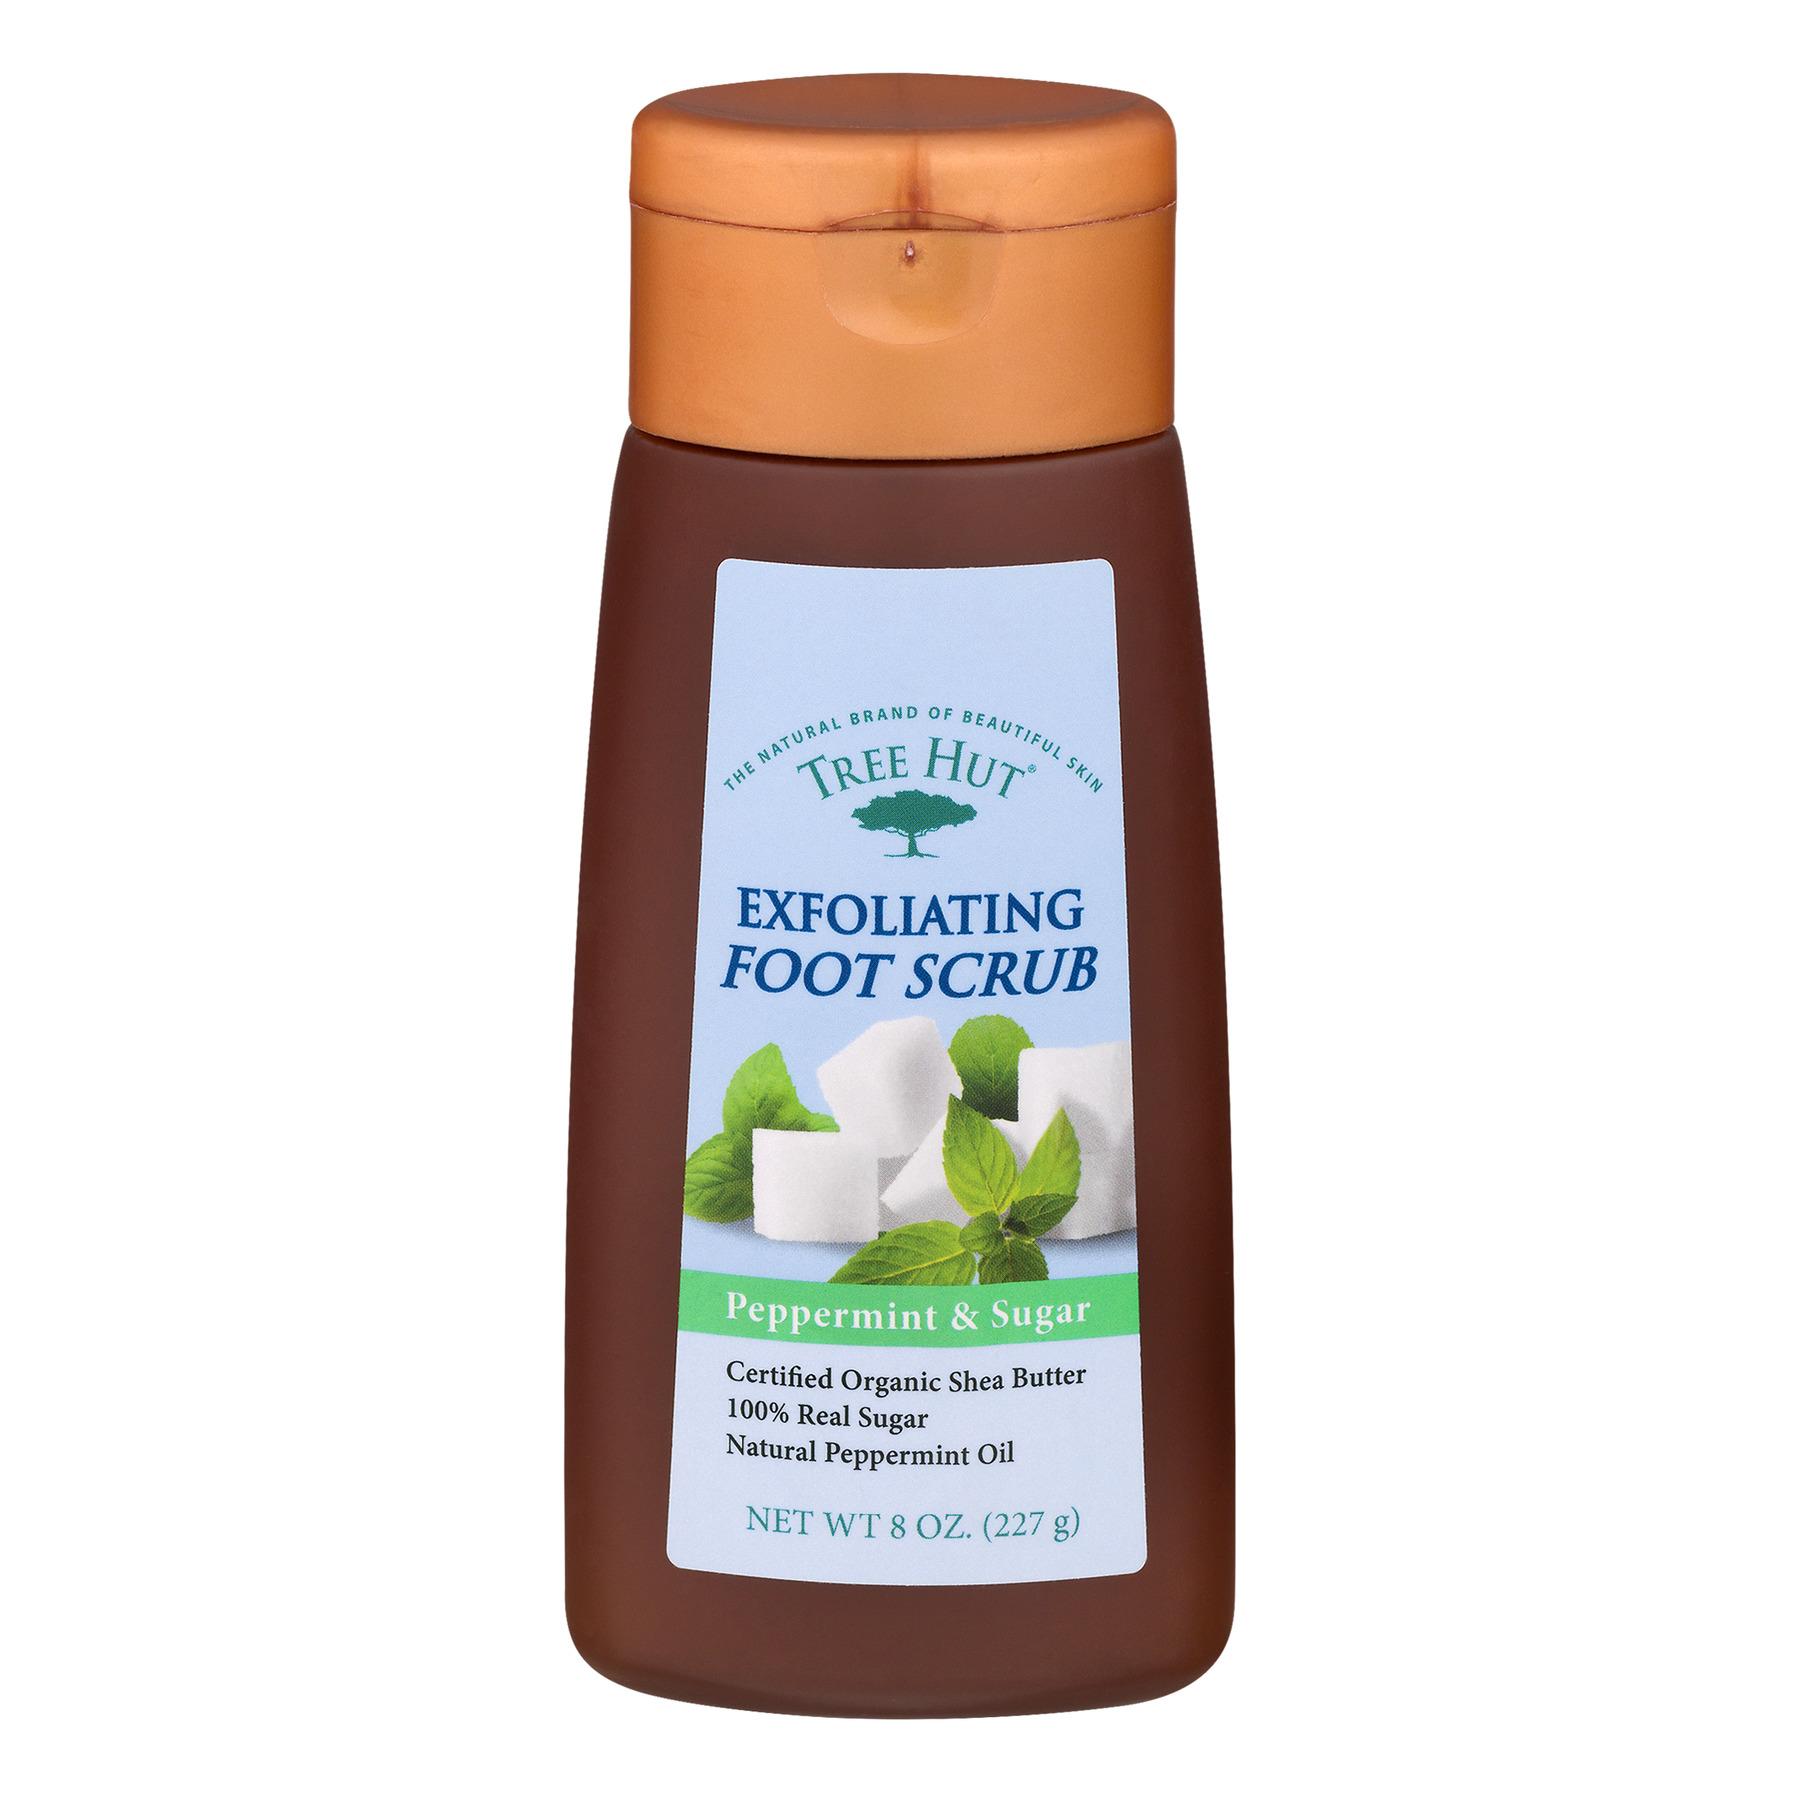 Tree Hut Peppermint & Sugar Exfoliating Foot Scrub, 8 Oz